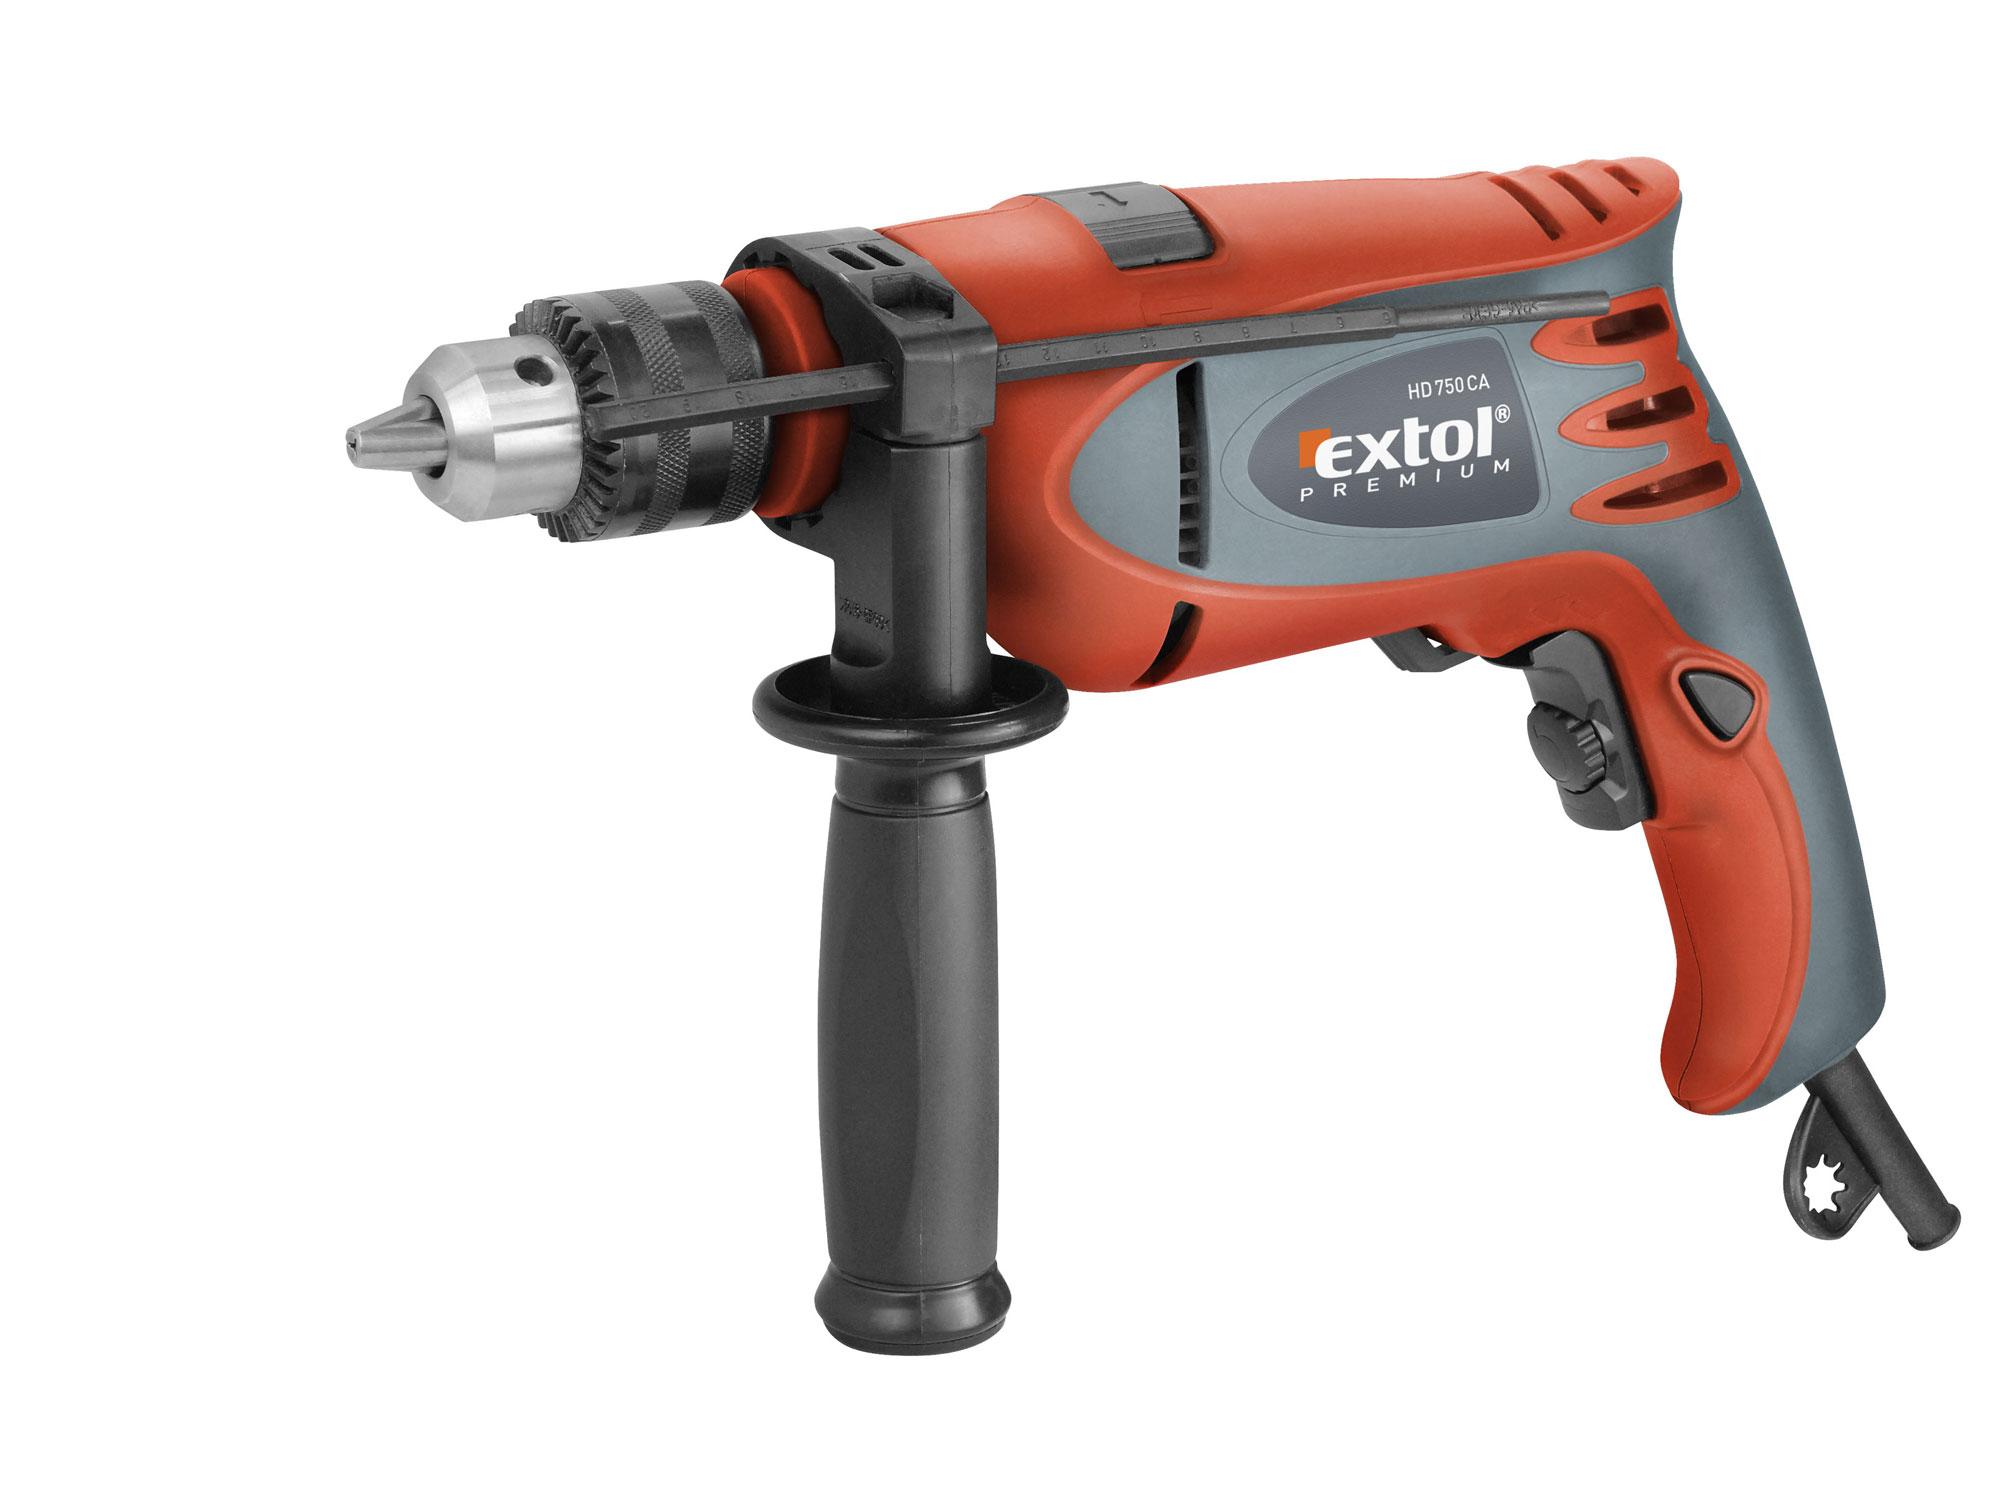 Vrtačka s příklepem HD 750 CA EXTOL PREMIUM 8890012